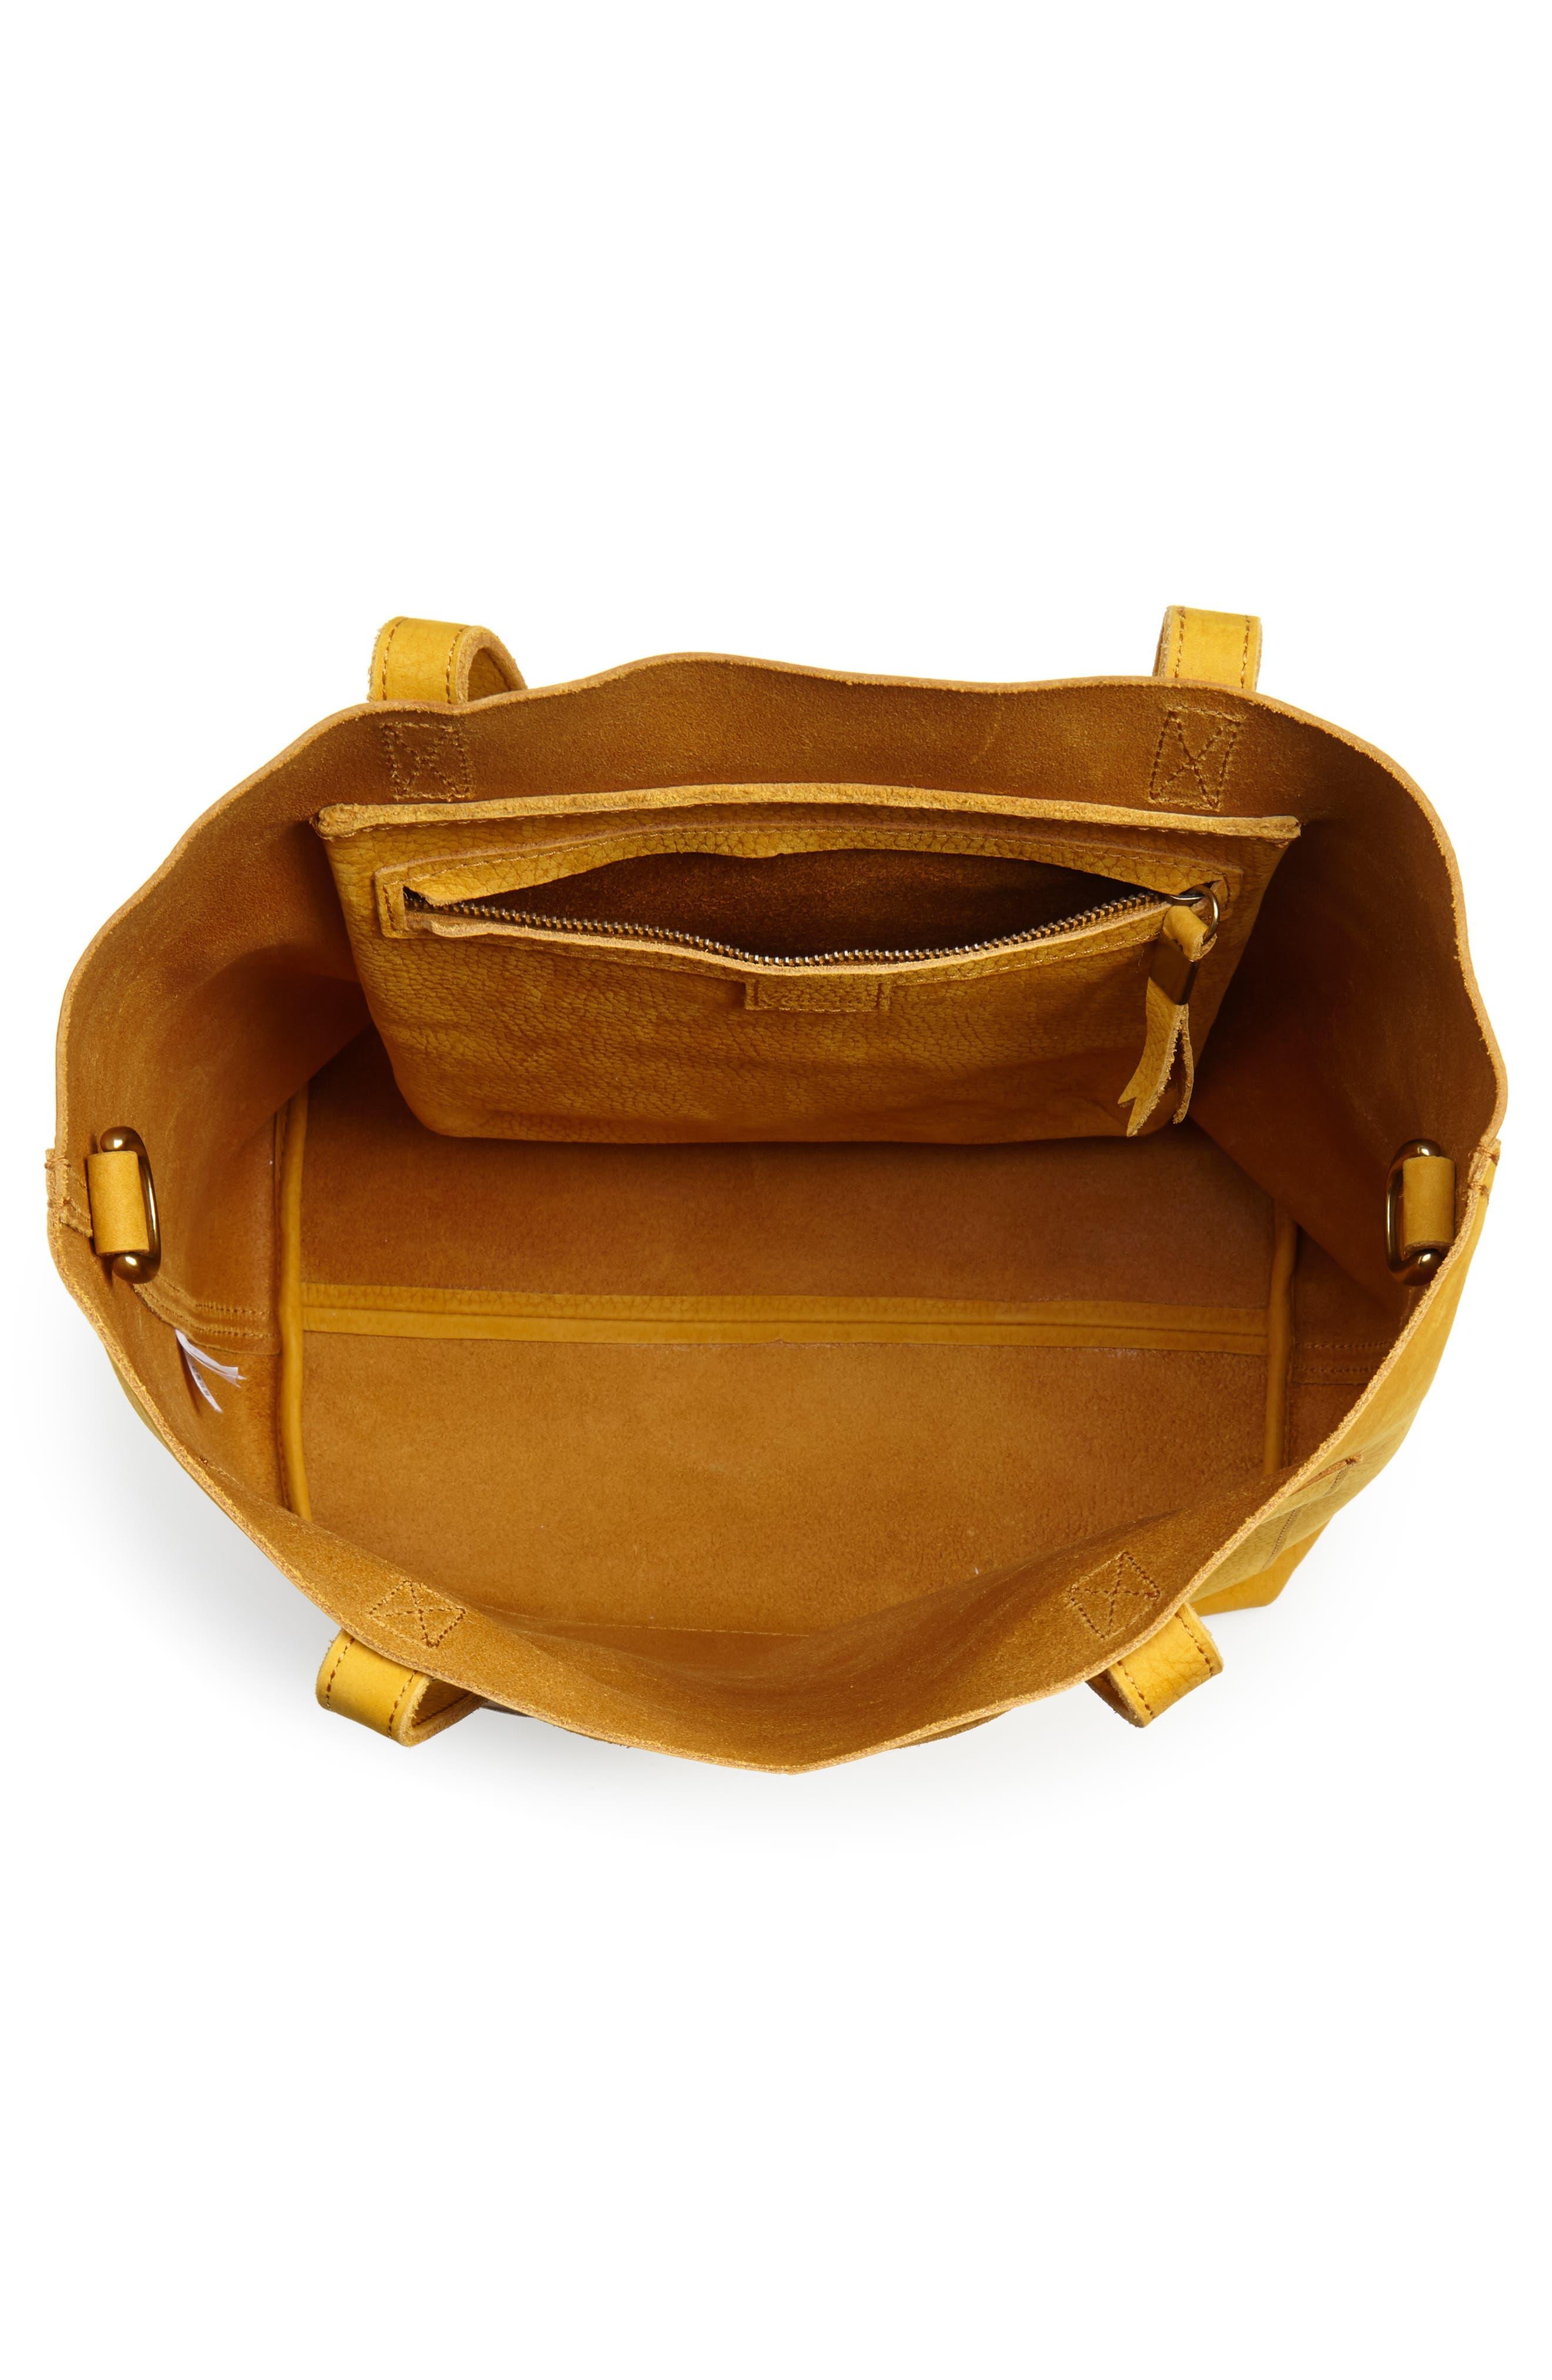 Medium Leather Transport Tote,                             Alternate thumbnail 5, color,                             Celestial Gold